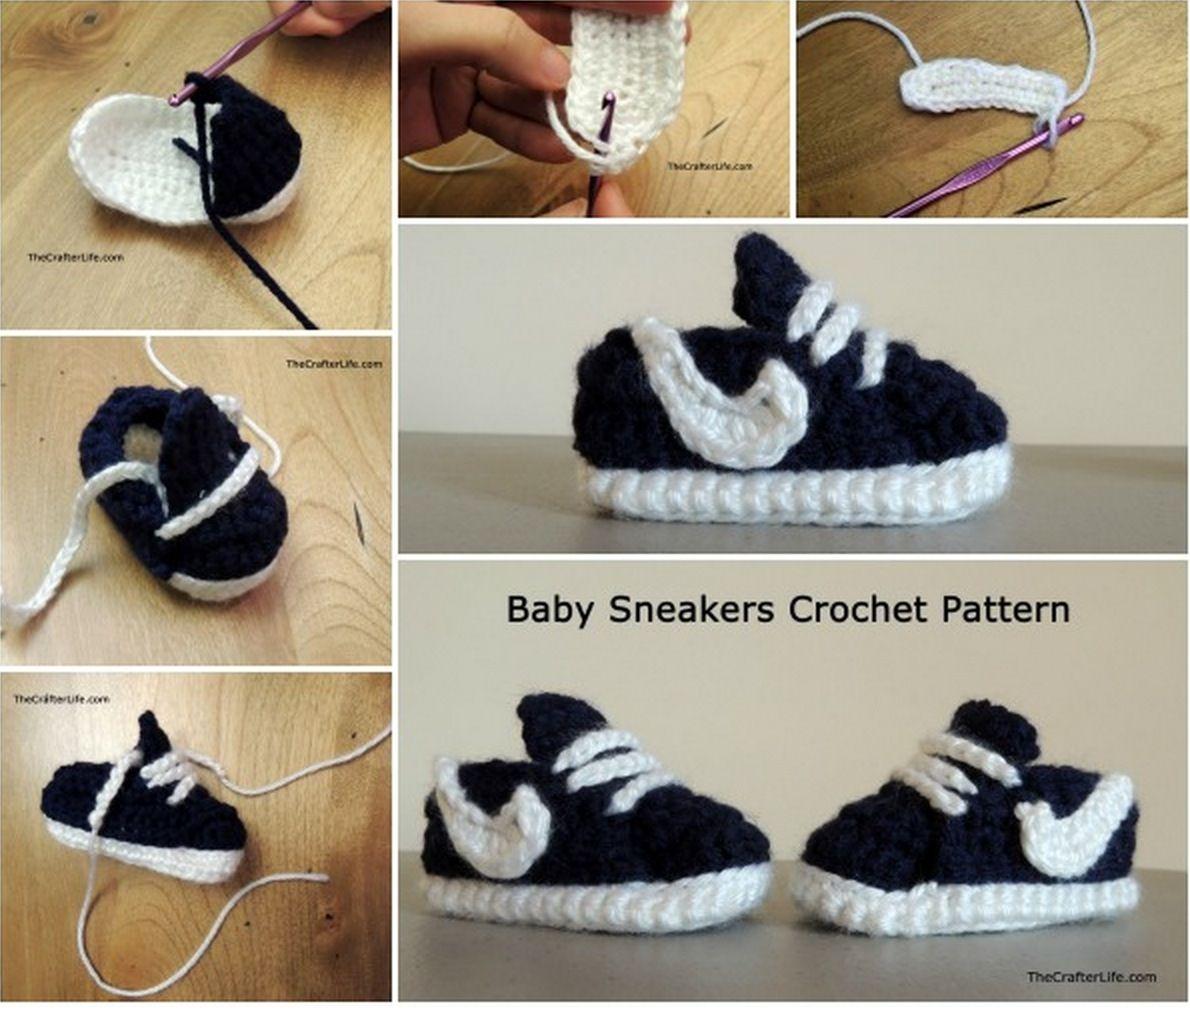 Crochet Converse Baby Booties Pattern Free Video Tutorial ...